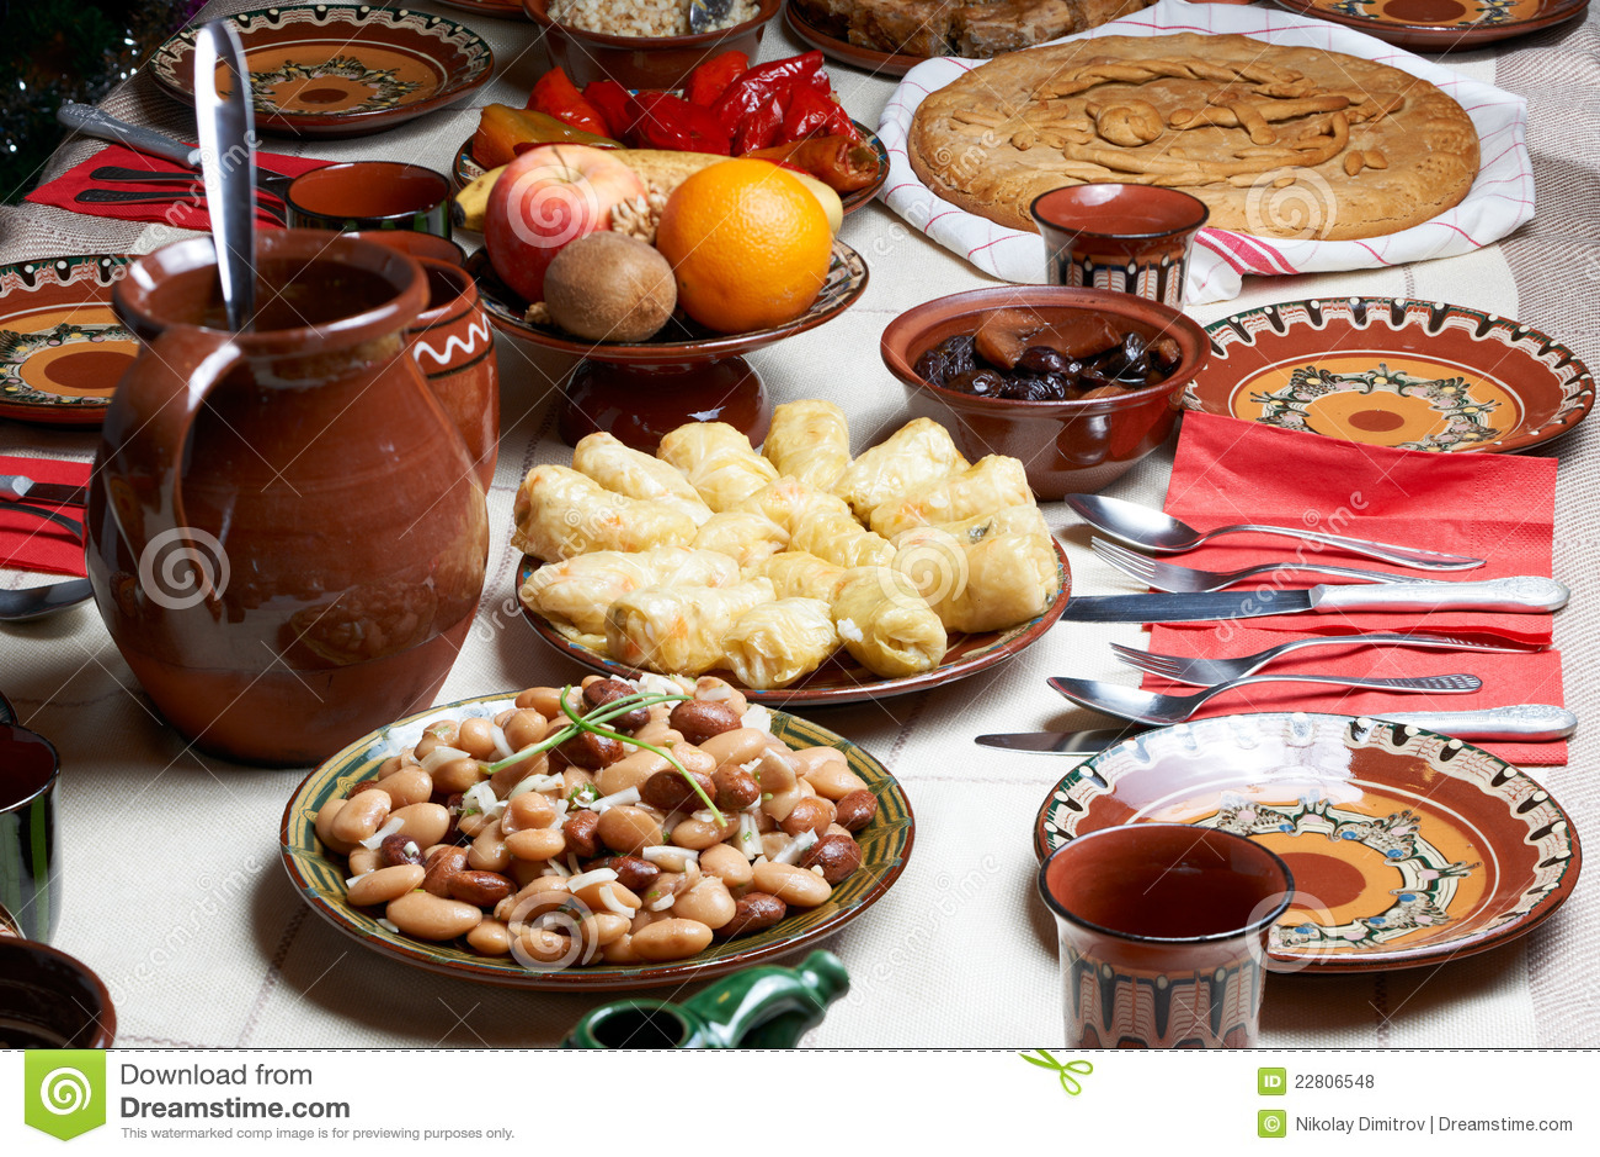 Traditional bulgarian christmas food royalty free stock photos image